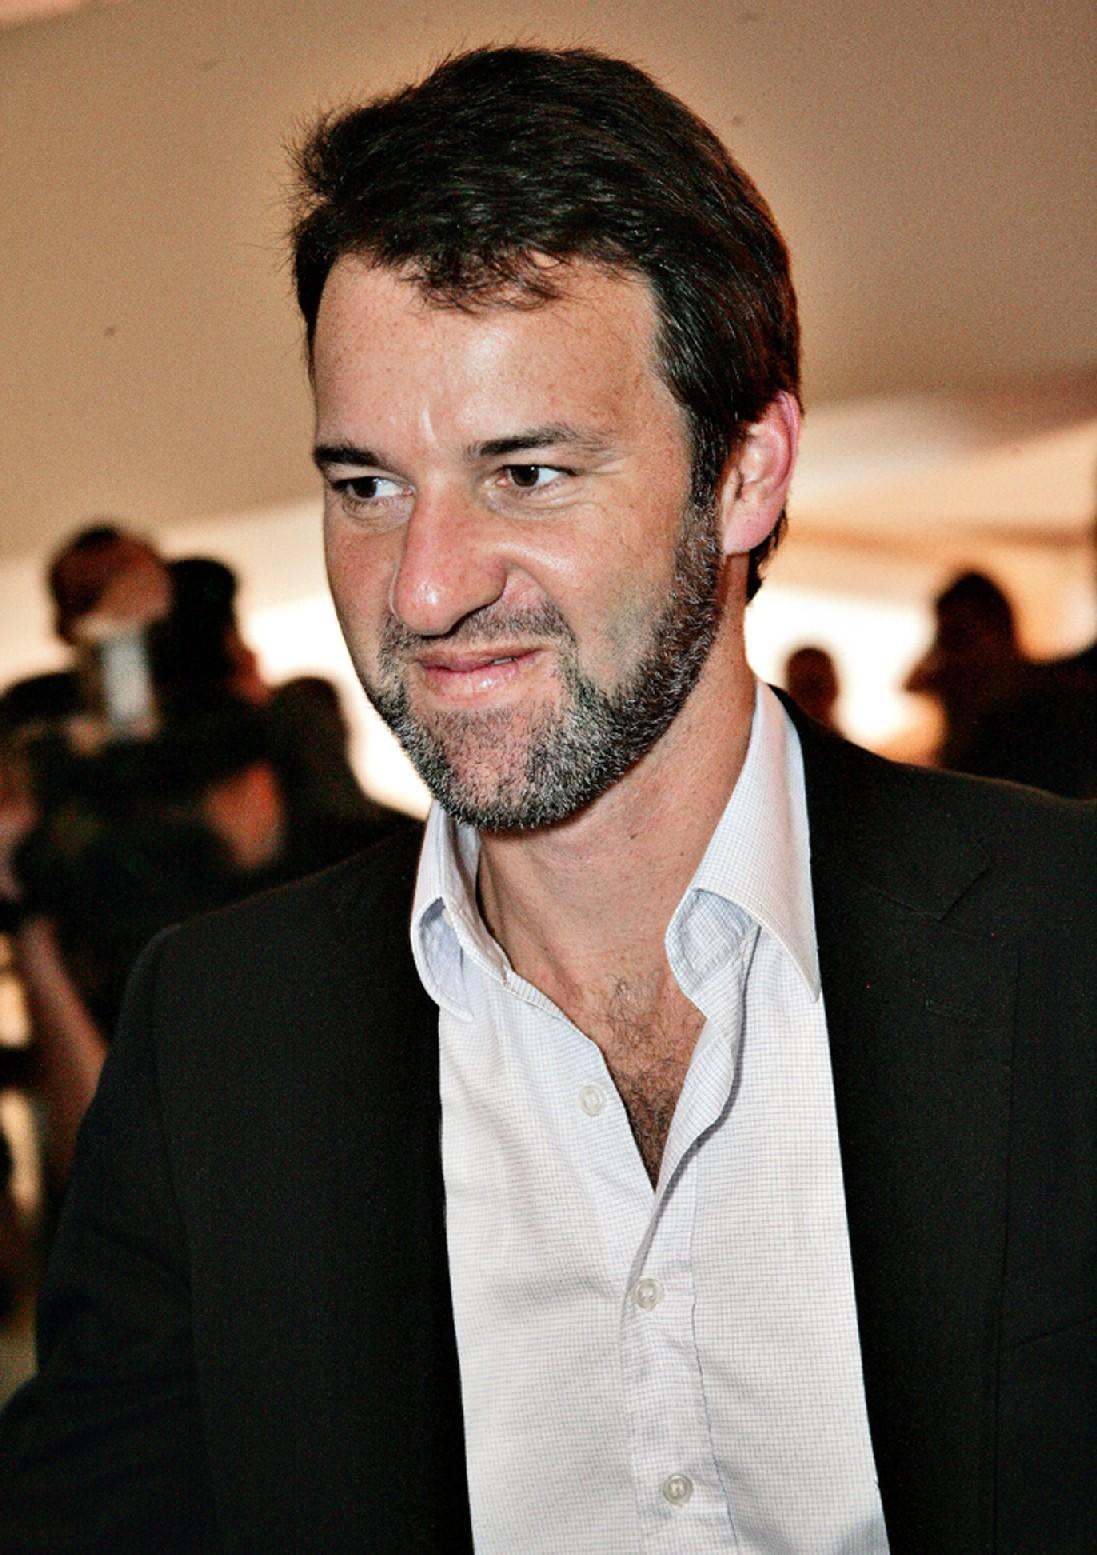 Eduardo Sirotsky